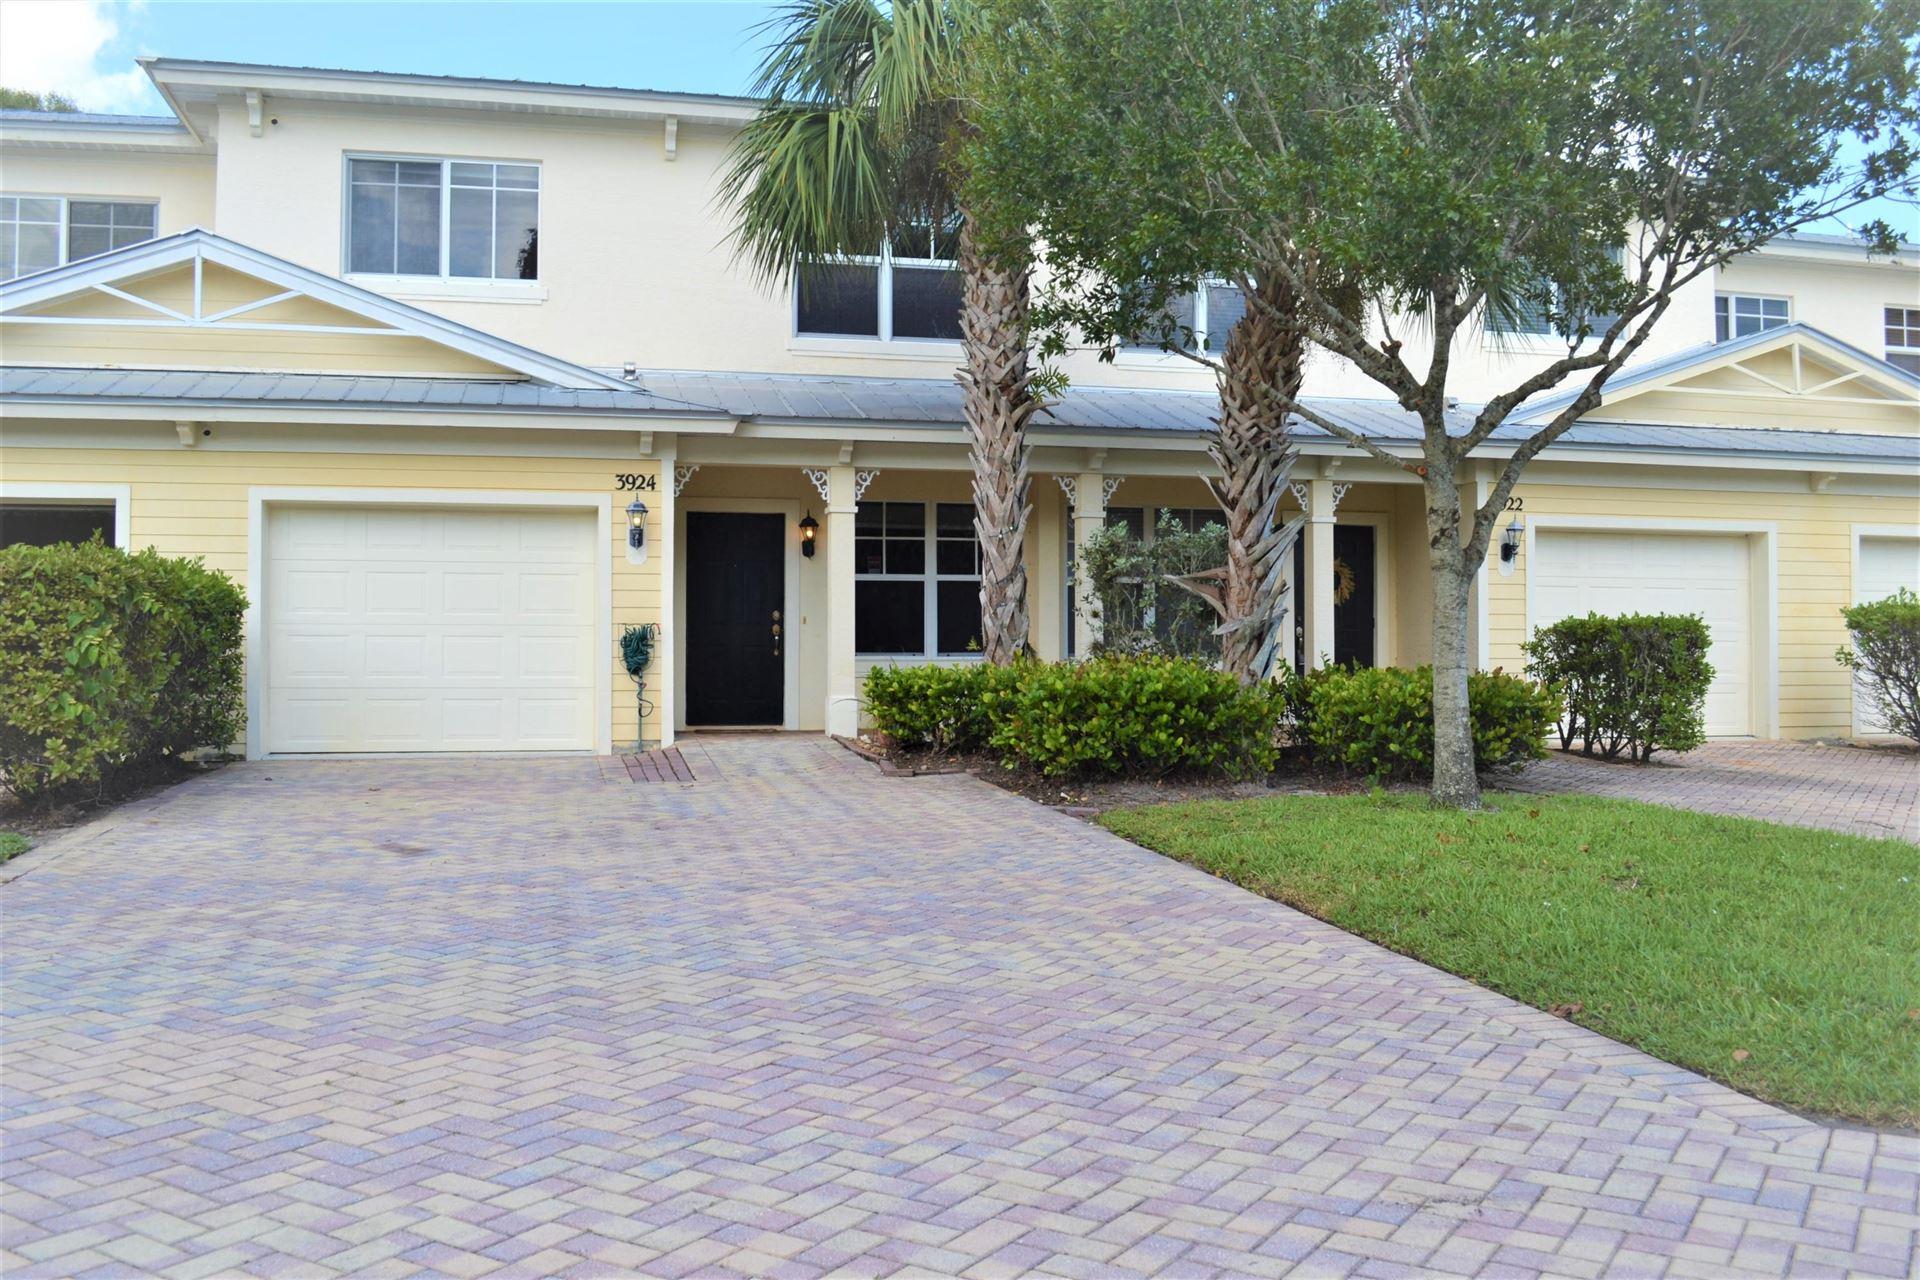 3924 Sabal Way, Fort Pierce, FL 34981 - #: RX-10663117